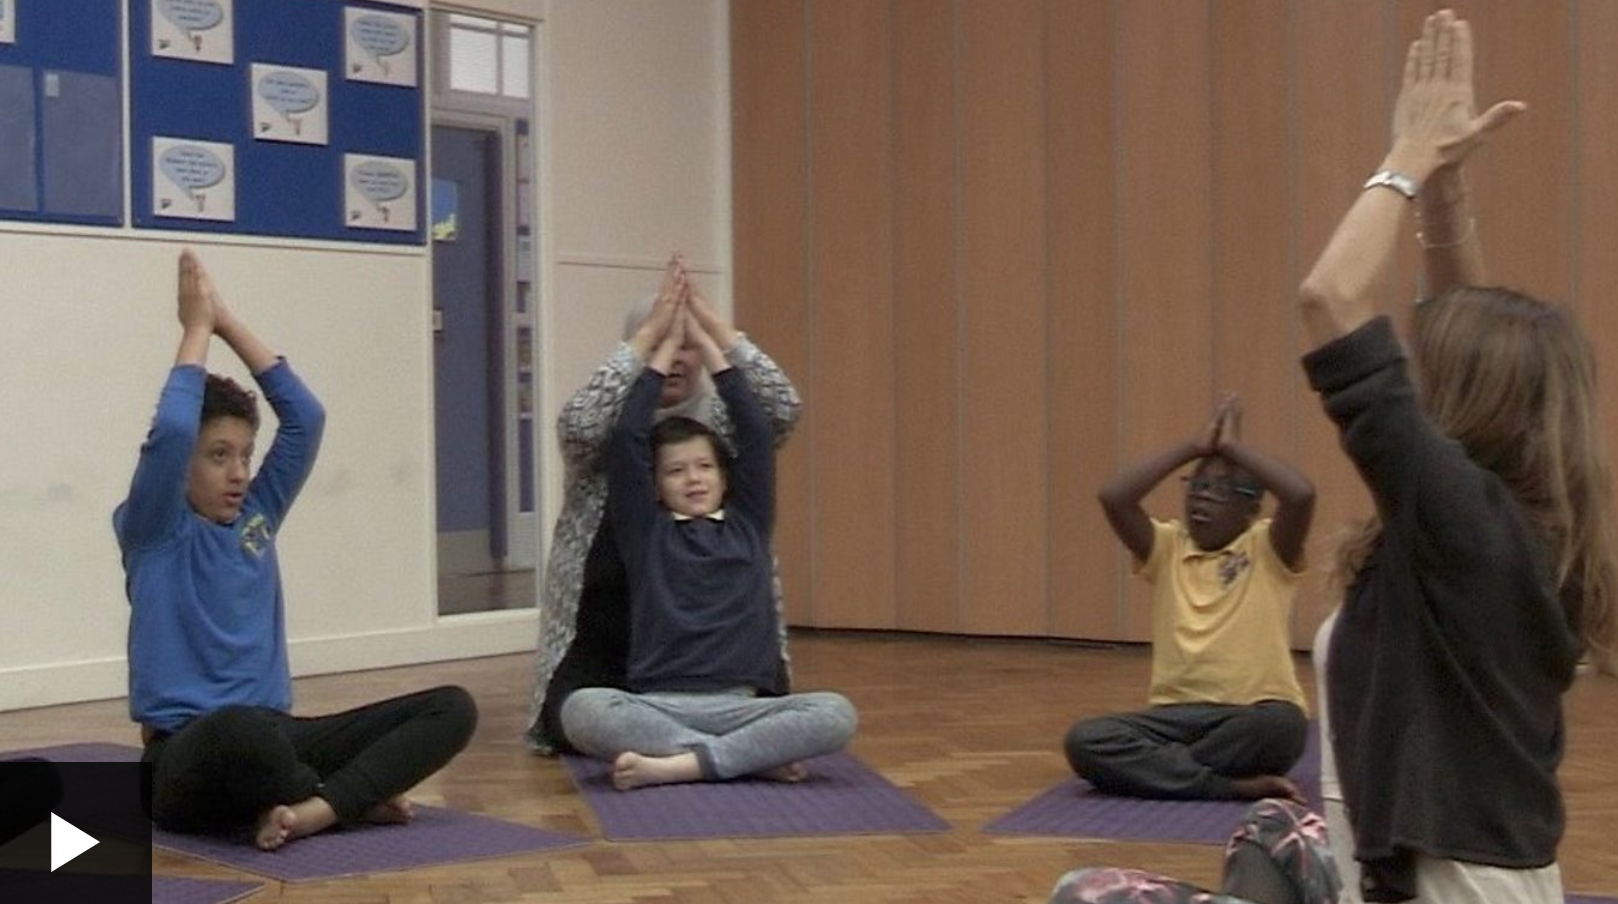 BBC News: Yoga Tells the Worries To Go Away